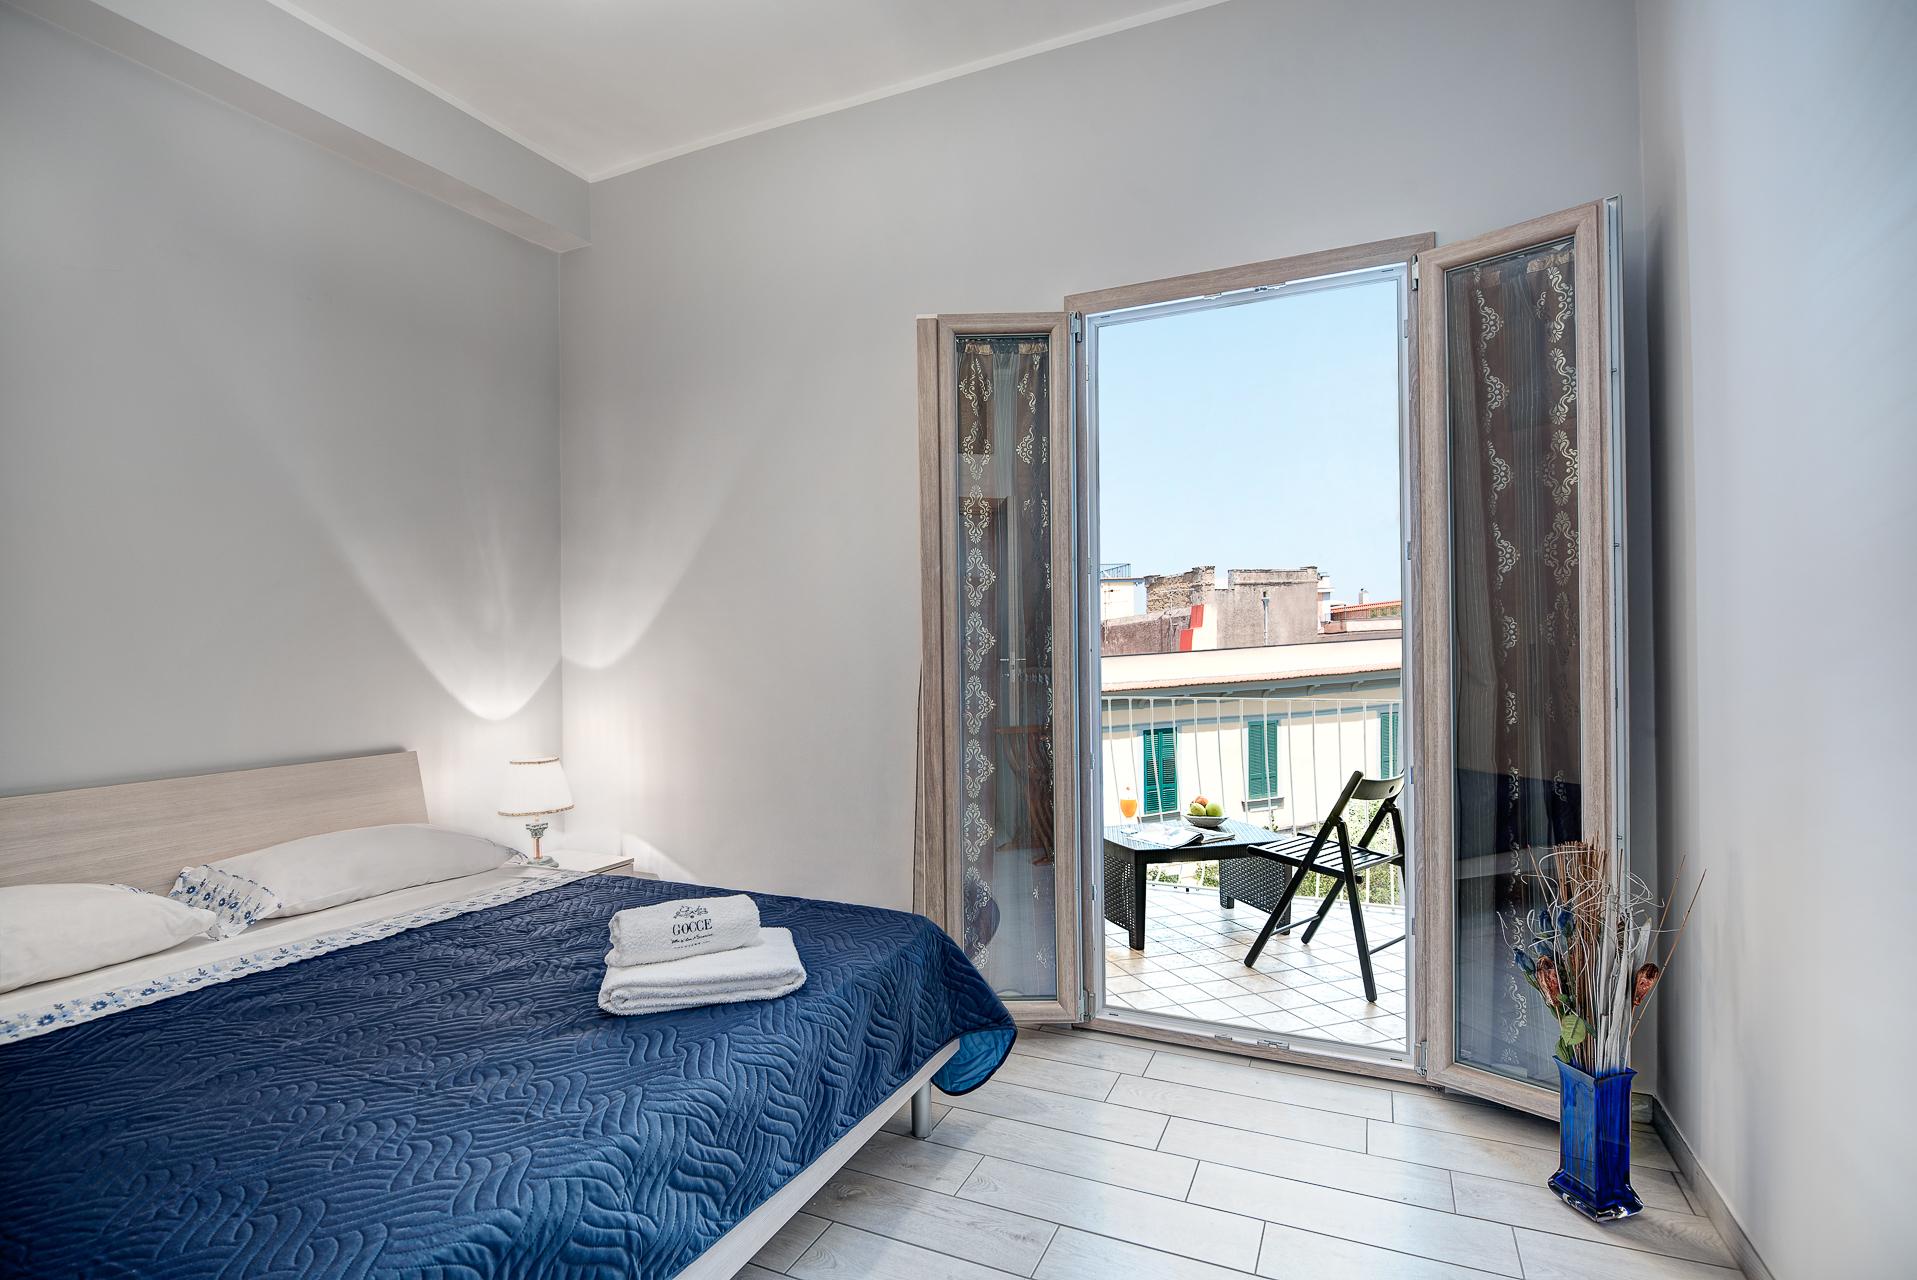 Apartment Giggino s Flat - Live like a local photo 19197345